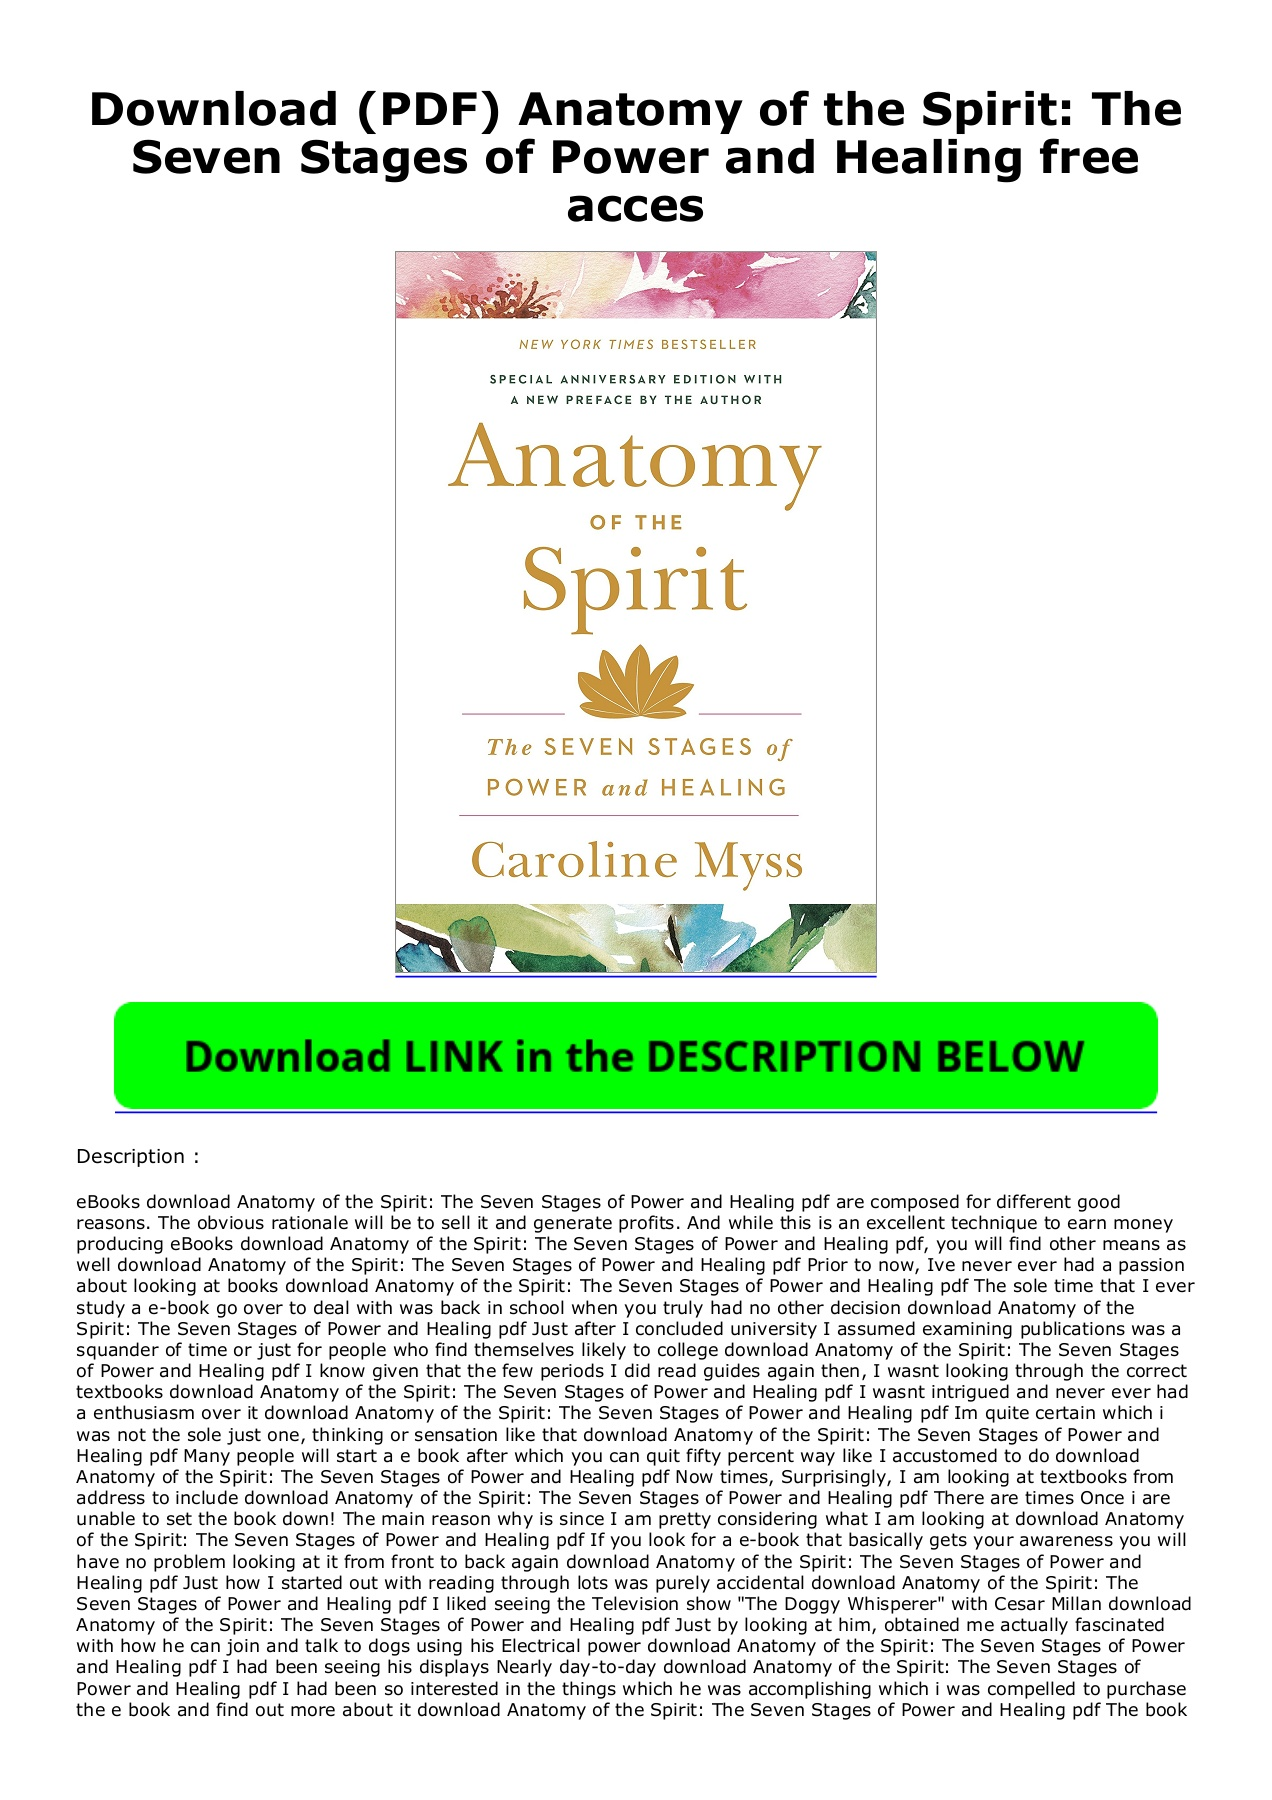 Anatomy Of The Spirit Pdf Download